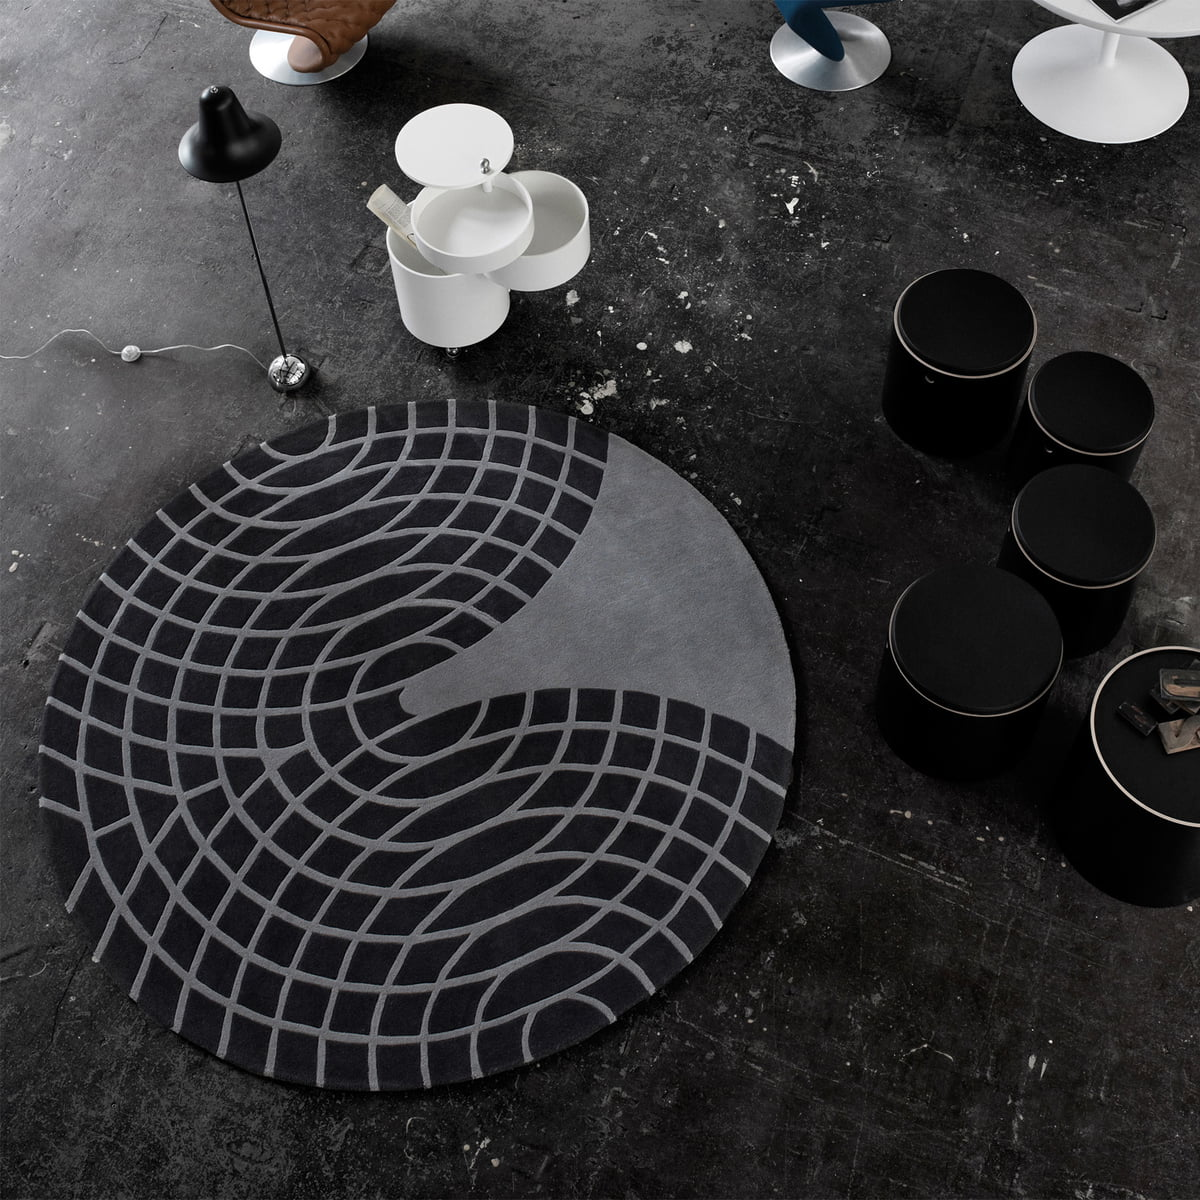 panton teppich von verpan. Black Bedroom Furniture Sets. Home Design Ideas